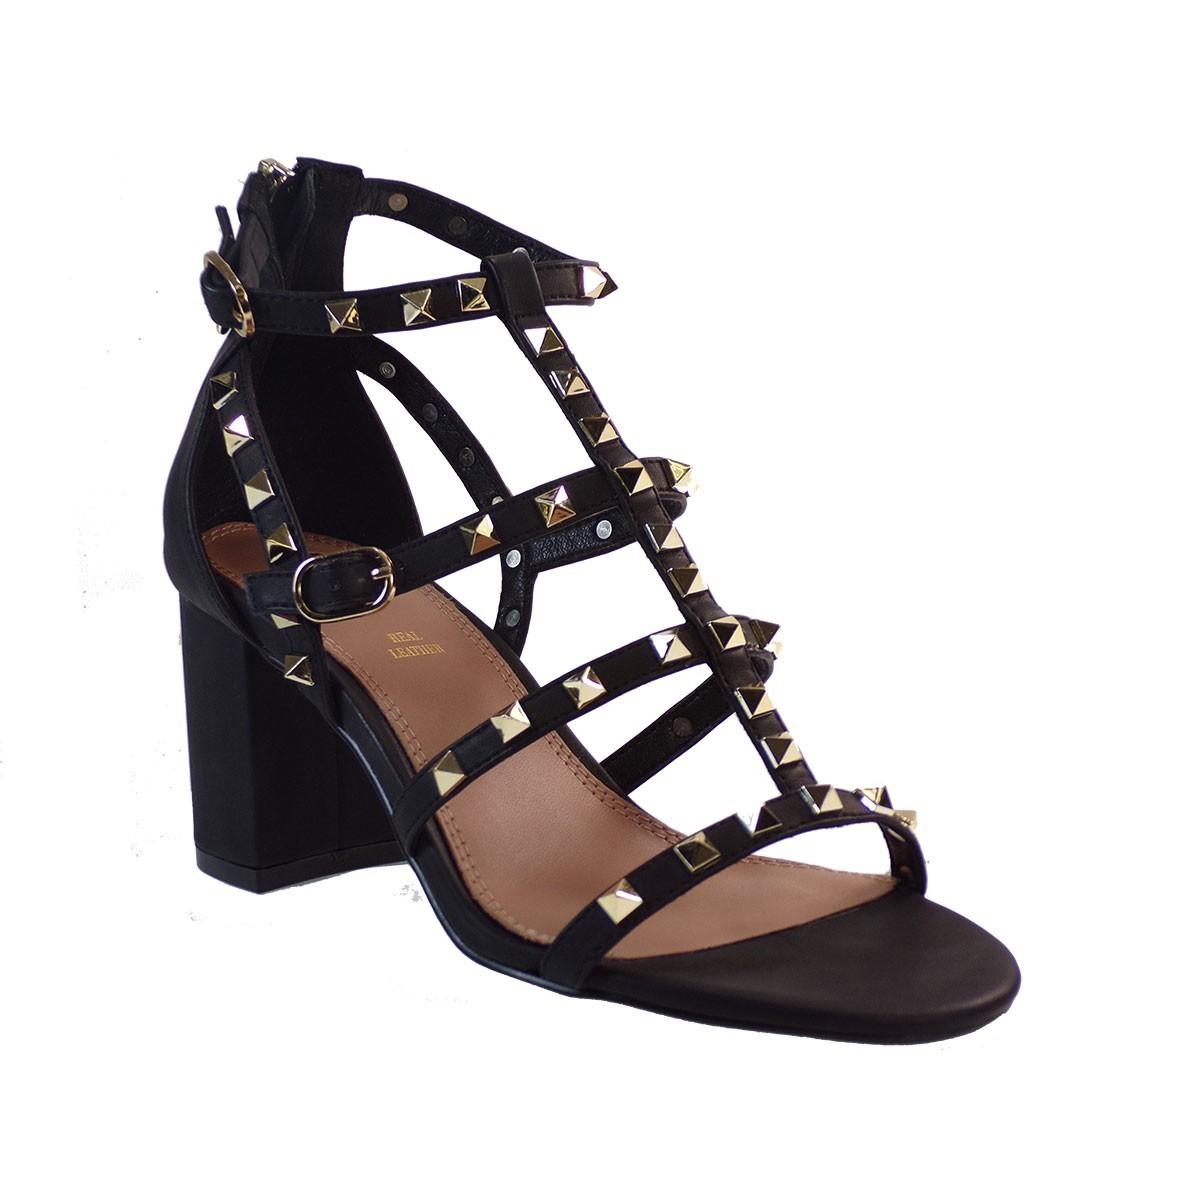 EXE Shoes Πέδιλα Γυναικεία ADELE-487 Μαύρο-Χρυσό Ι4700487400